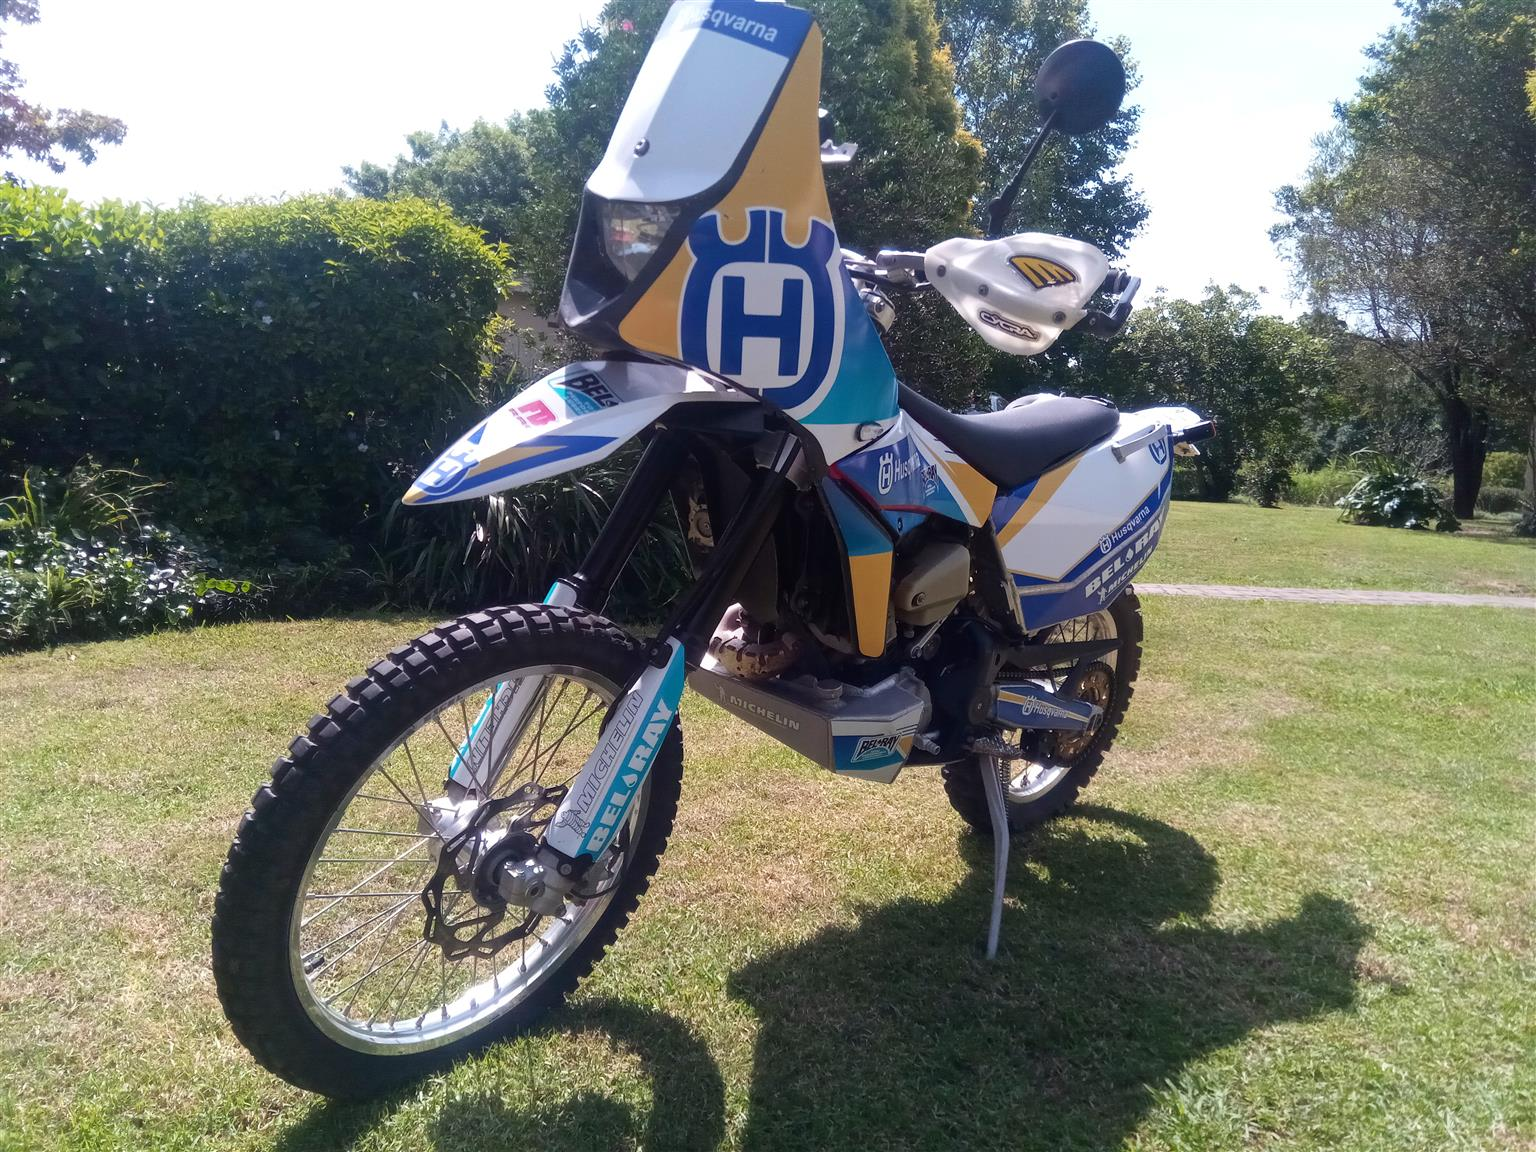 2014 Husqvarna FE 501 Enduro